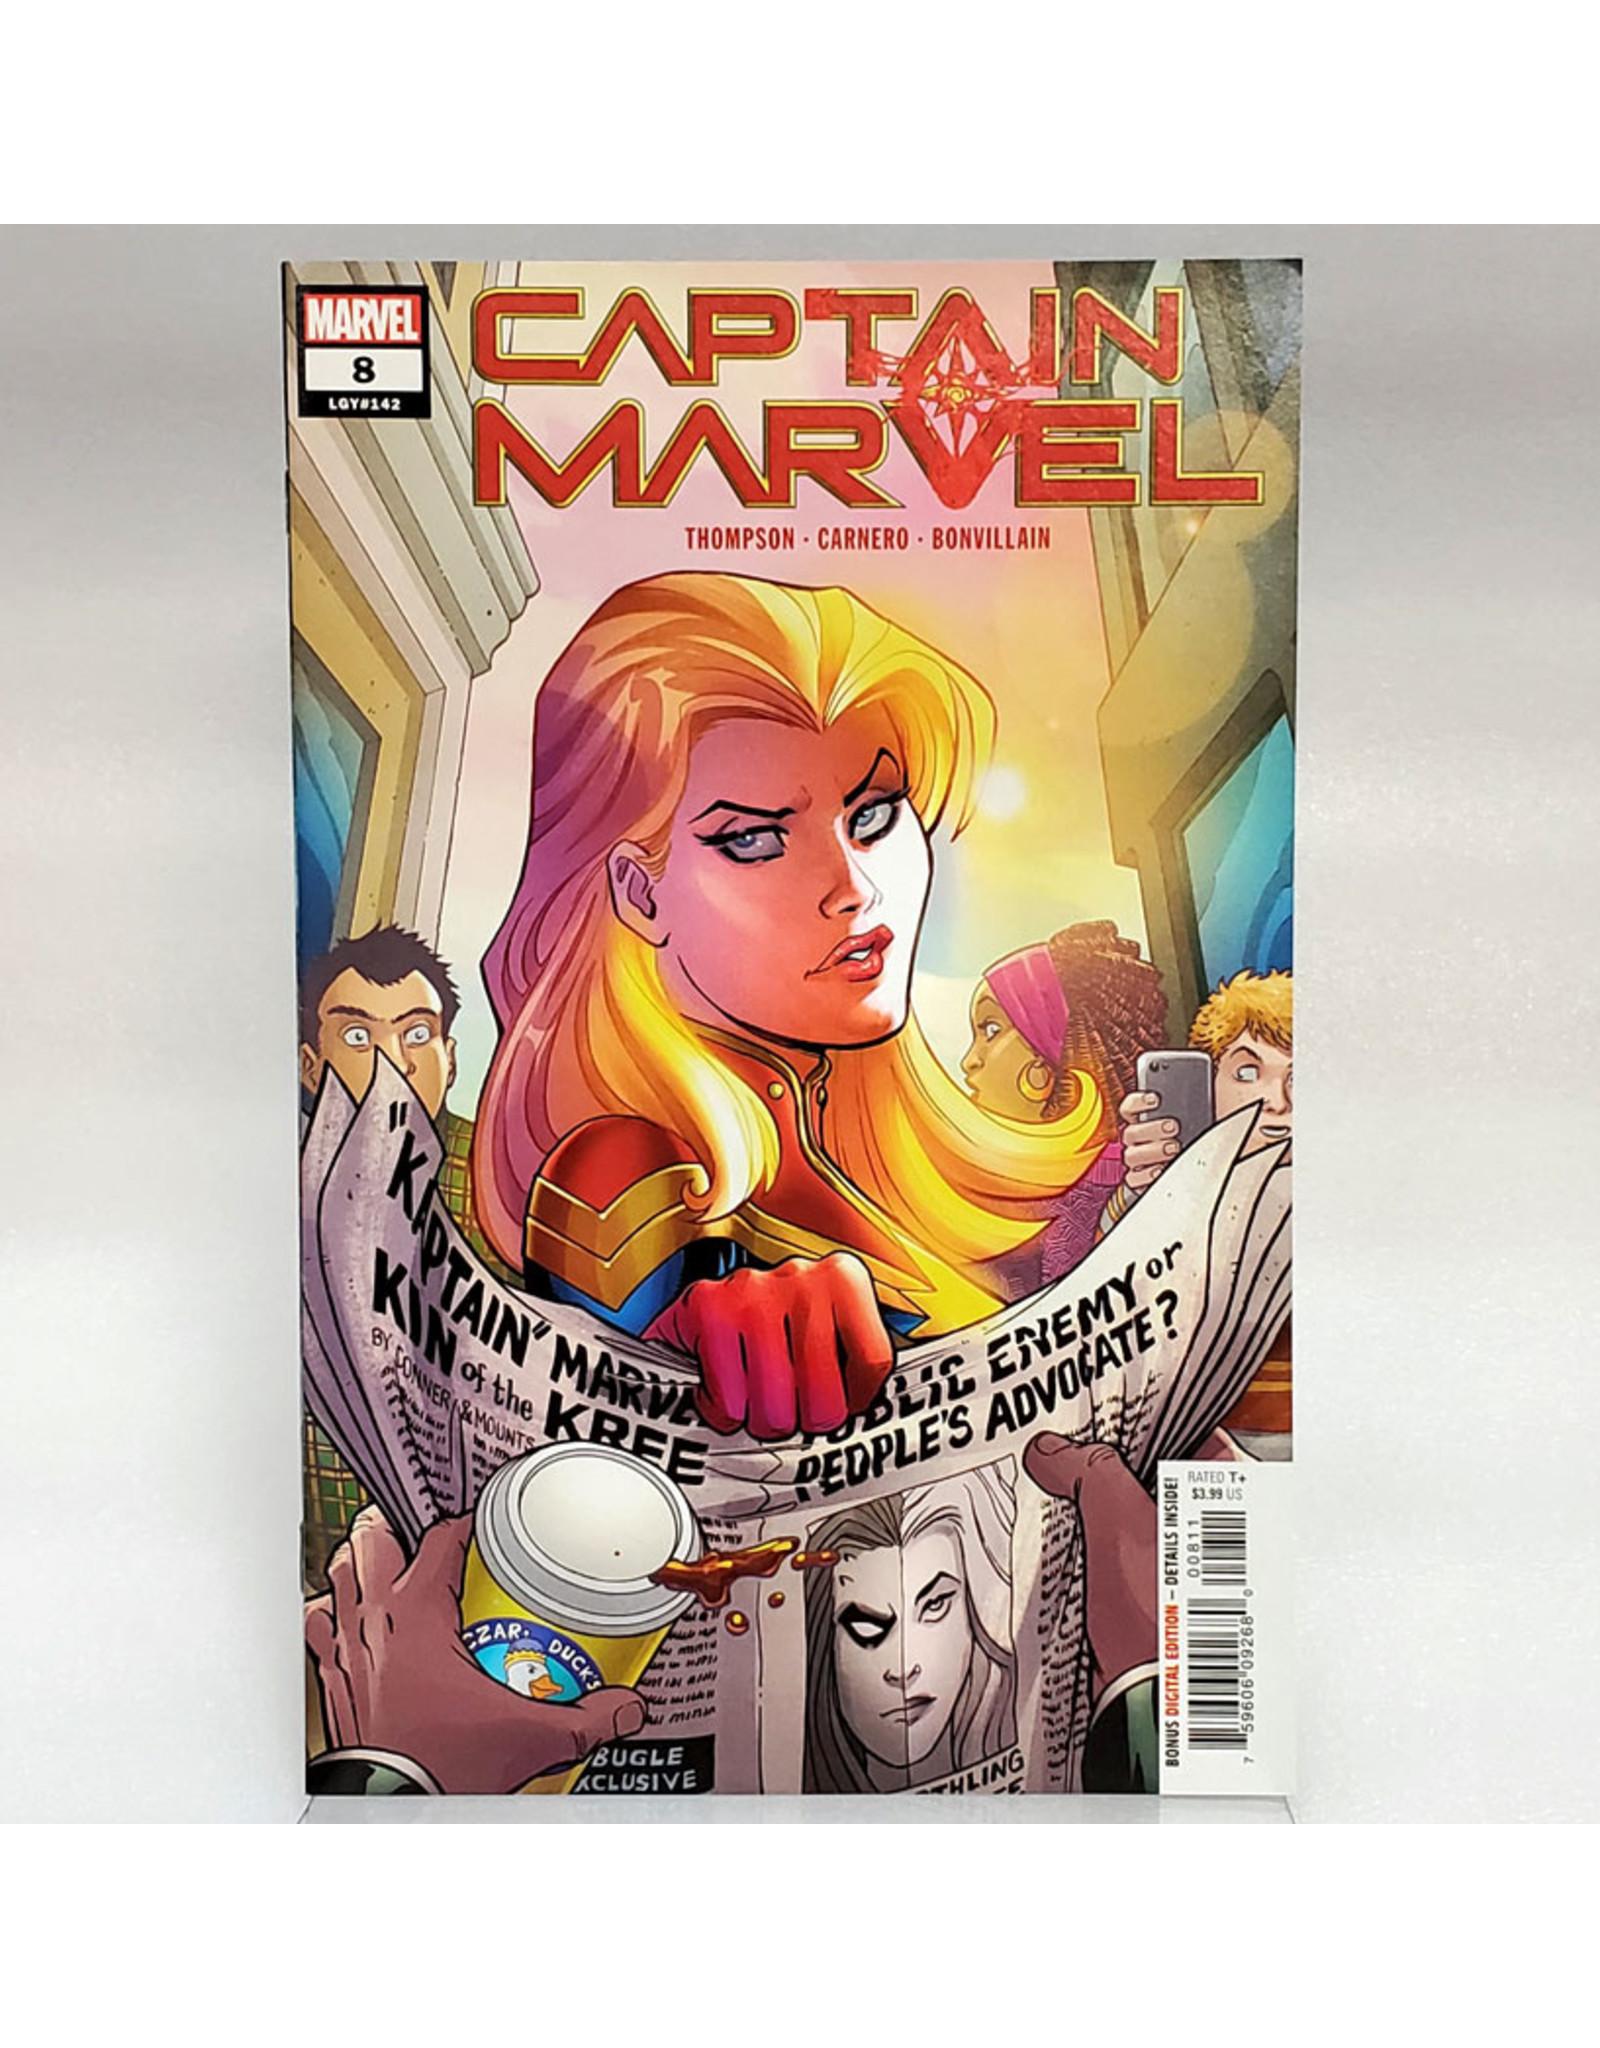 MARVEL COMICS CAPTAIN MARVEL #8